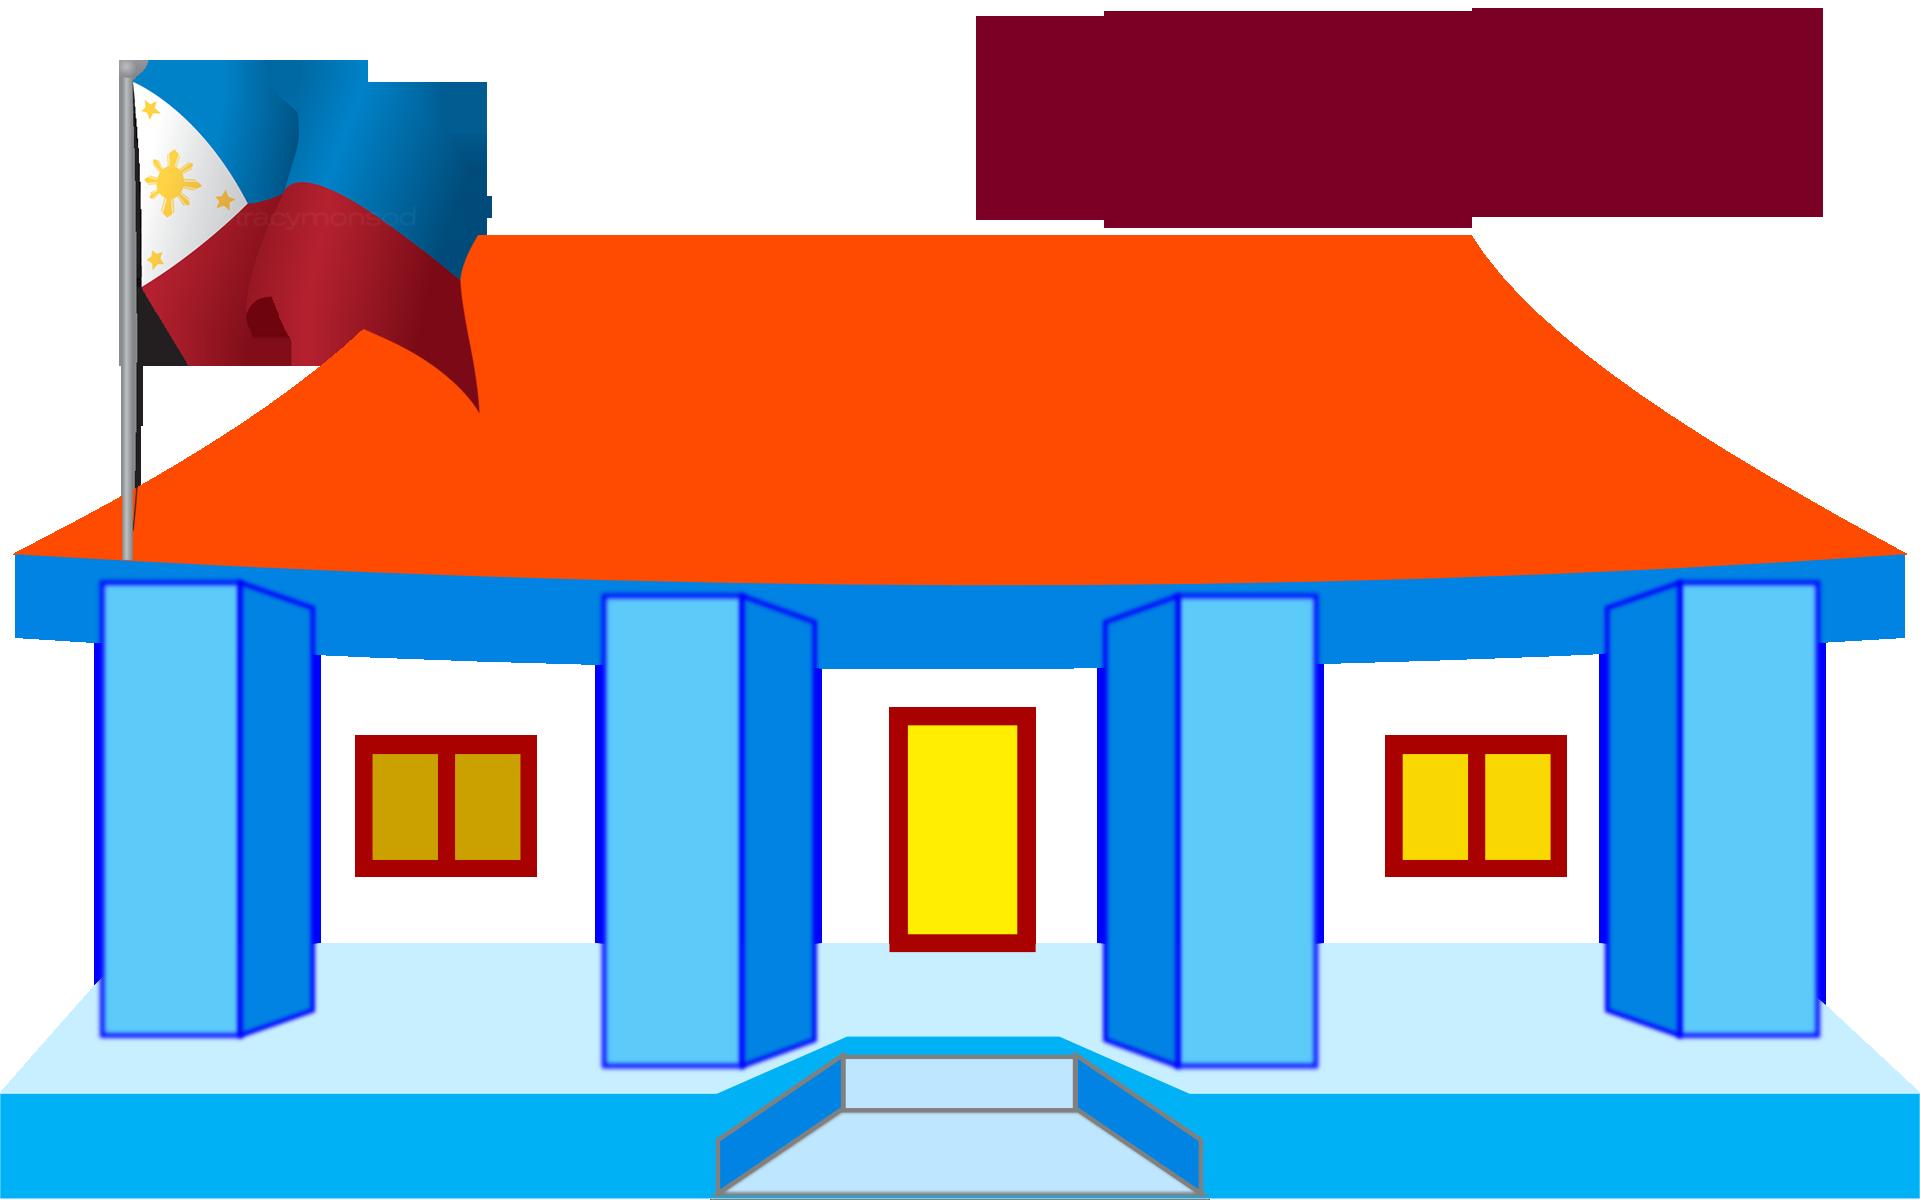 Philippines Filipino Cuisine Fiesta In America, Inc. Logo Clip Art, PNG,  900x281px, Philippines, Area, Brand, Festival,